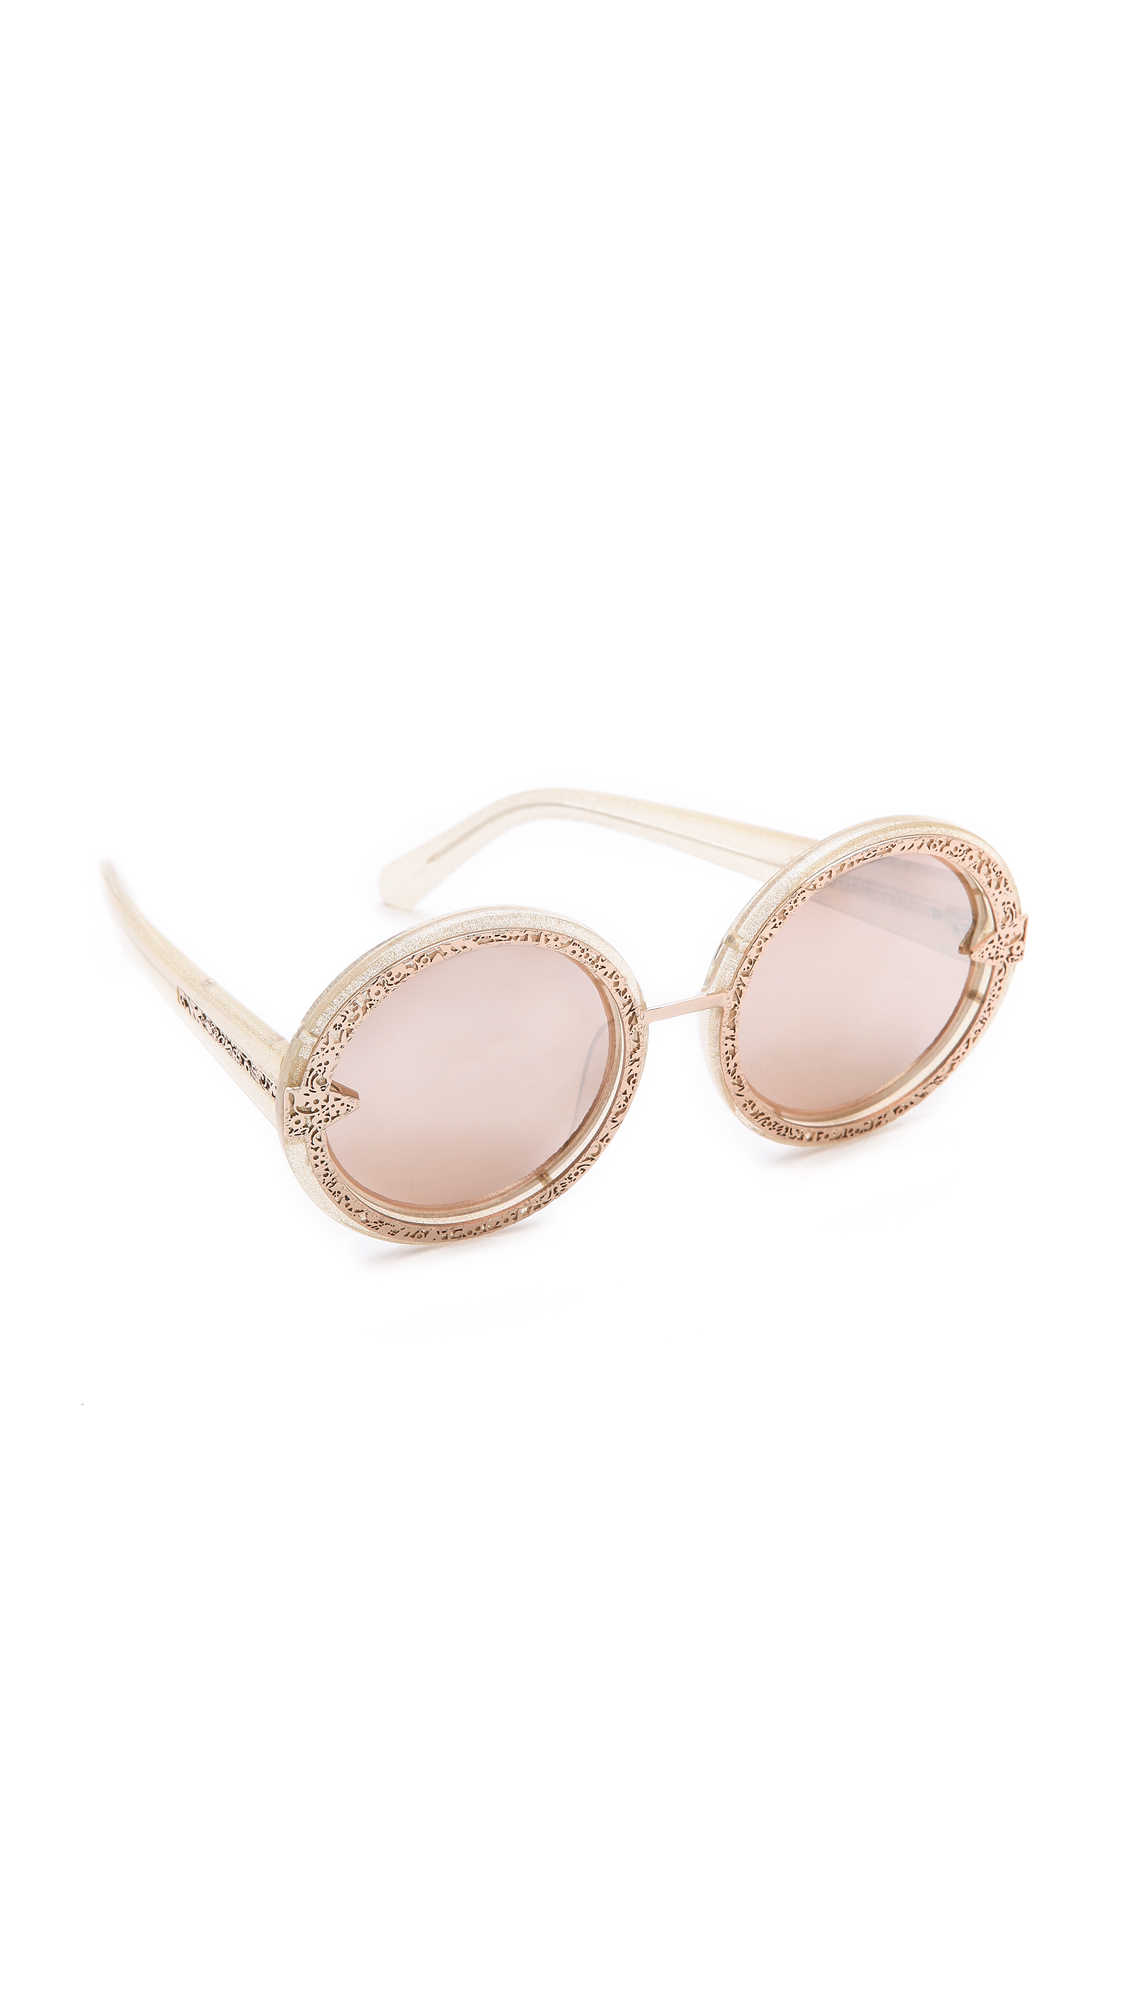 d8aa825bcc9c Karen Walker Orbit Filigree Sunglasses